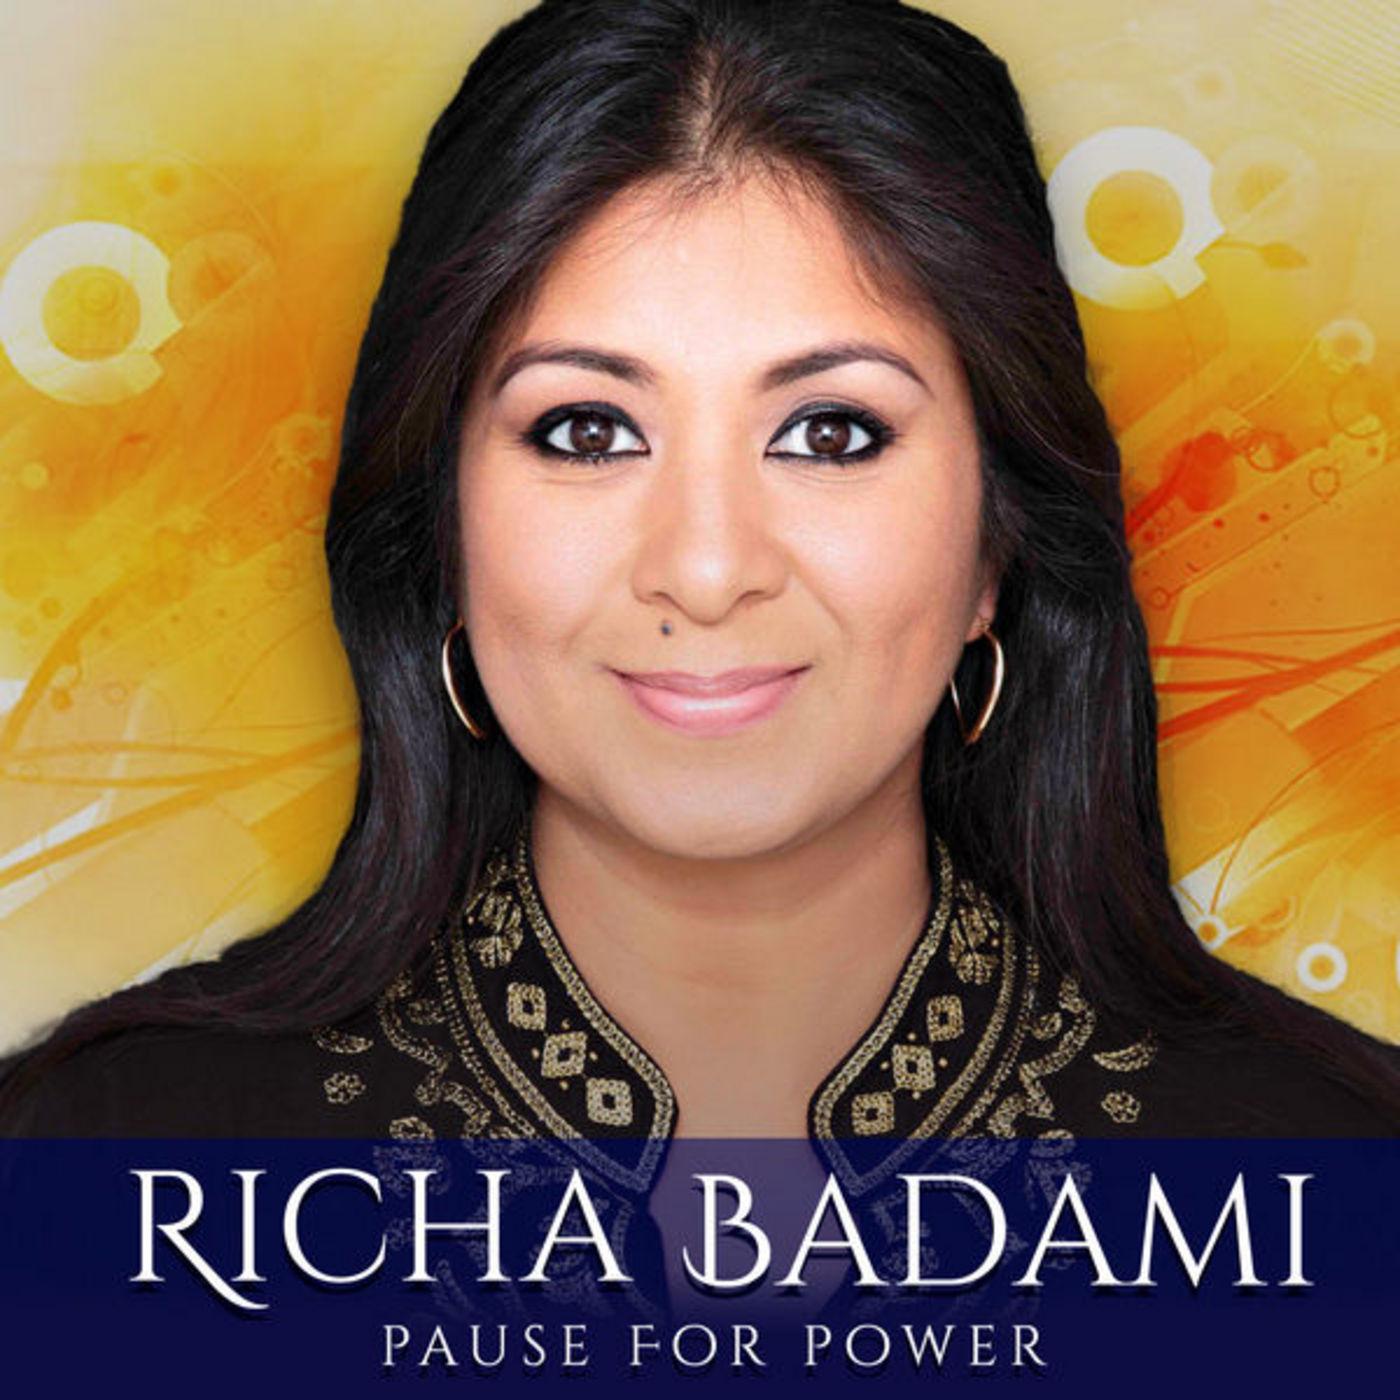 <![CDATA[Richa Badami's Pause For Power Radio]]>